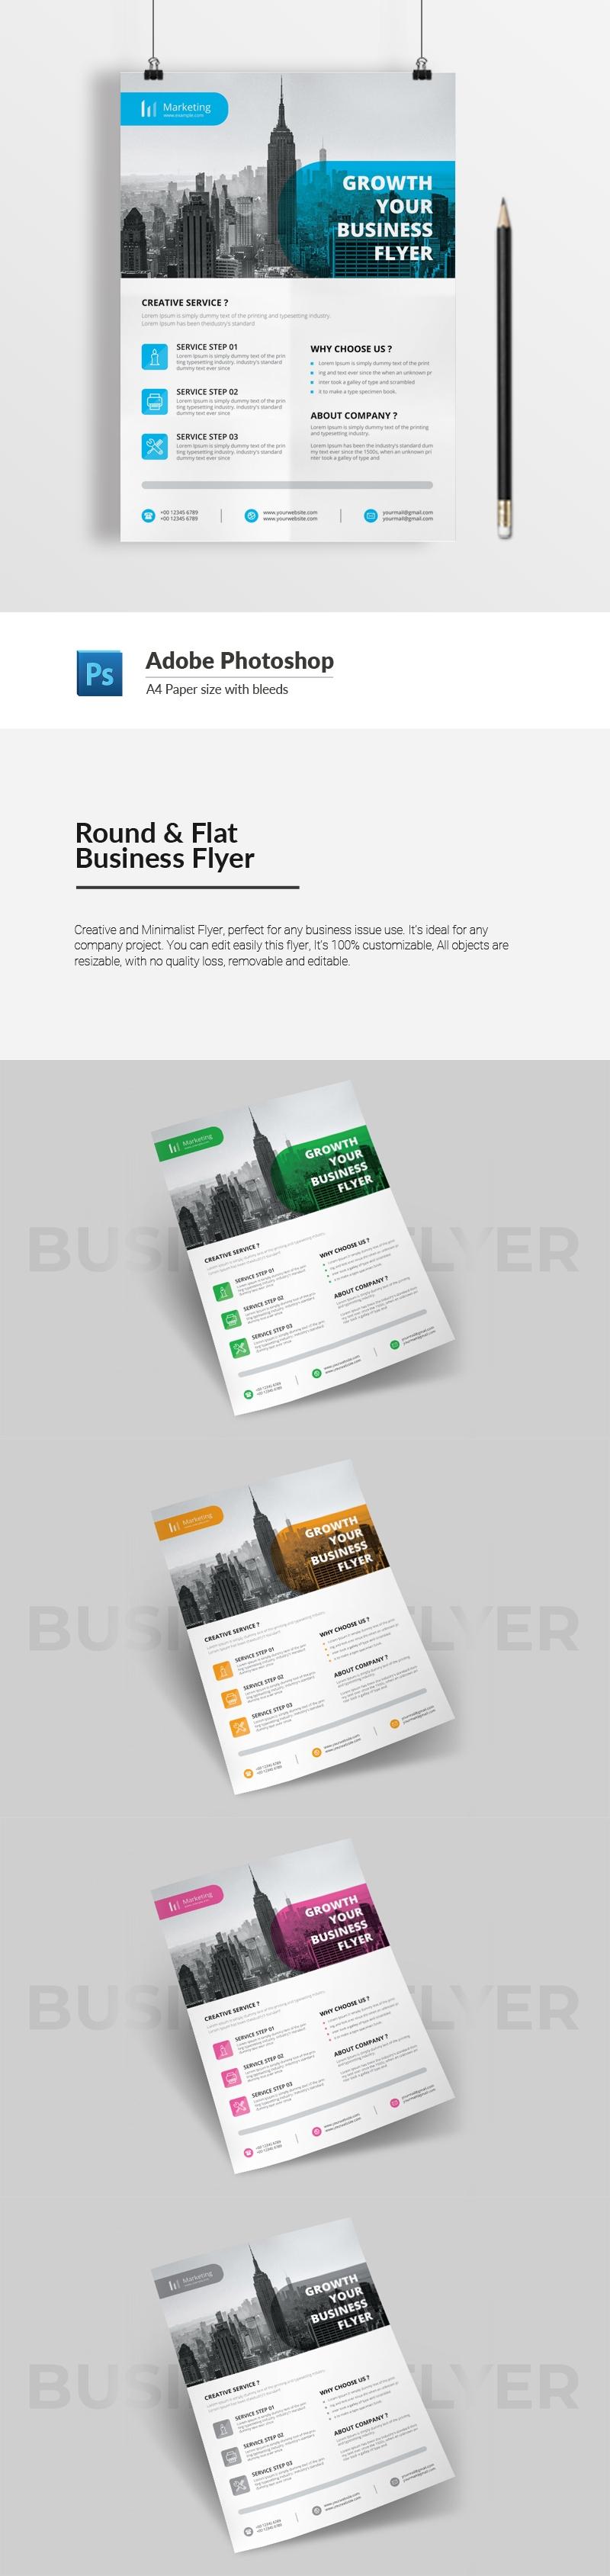 Round & Flat Business Flyer